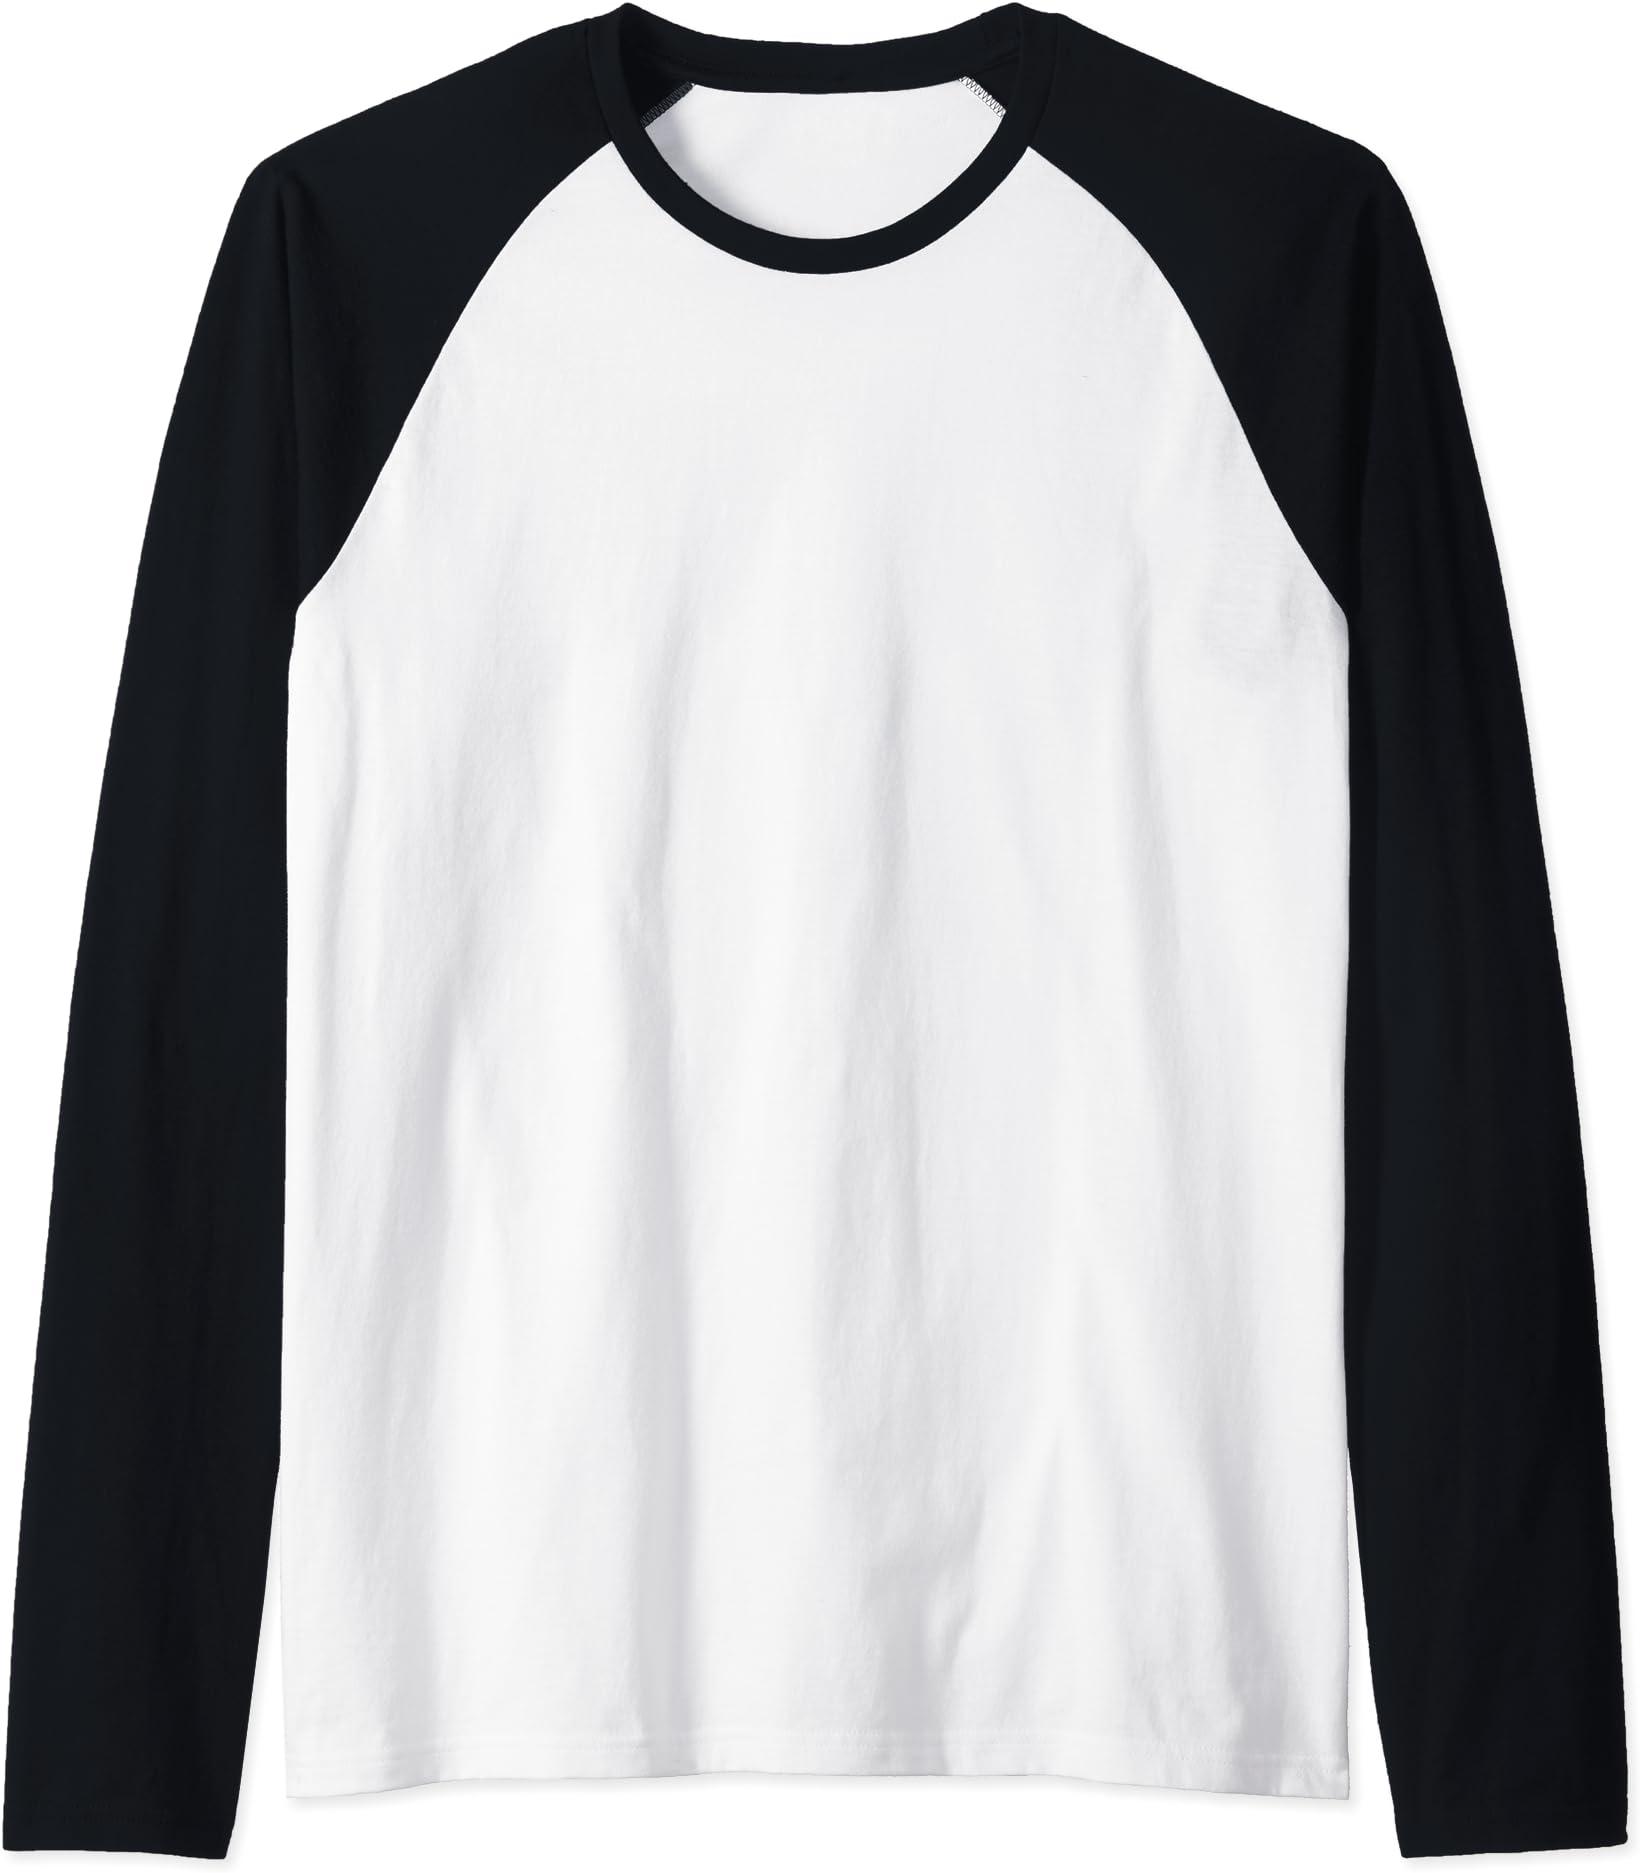 Ww2 Uboat Submarine Childrens Long Sleeve T-Shirt Boys Cotton Tee Tops